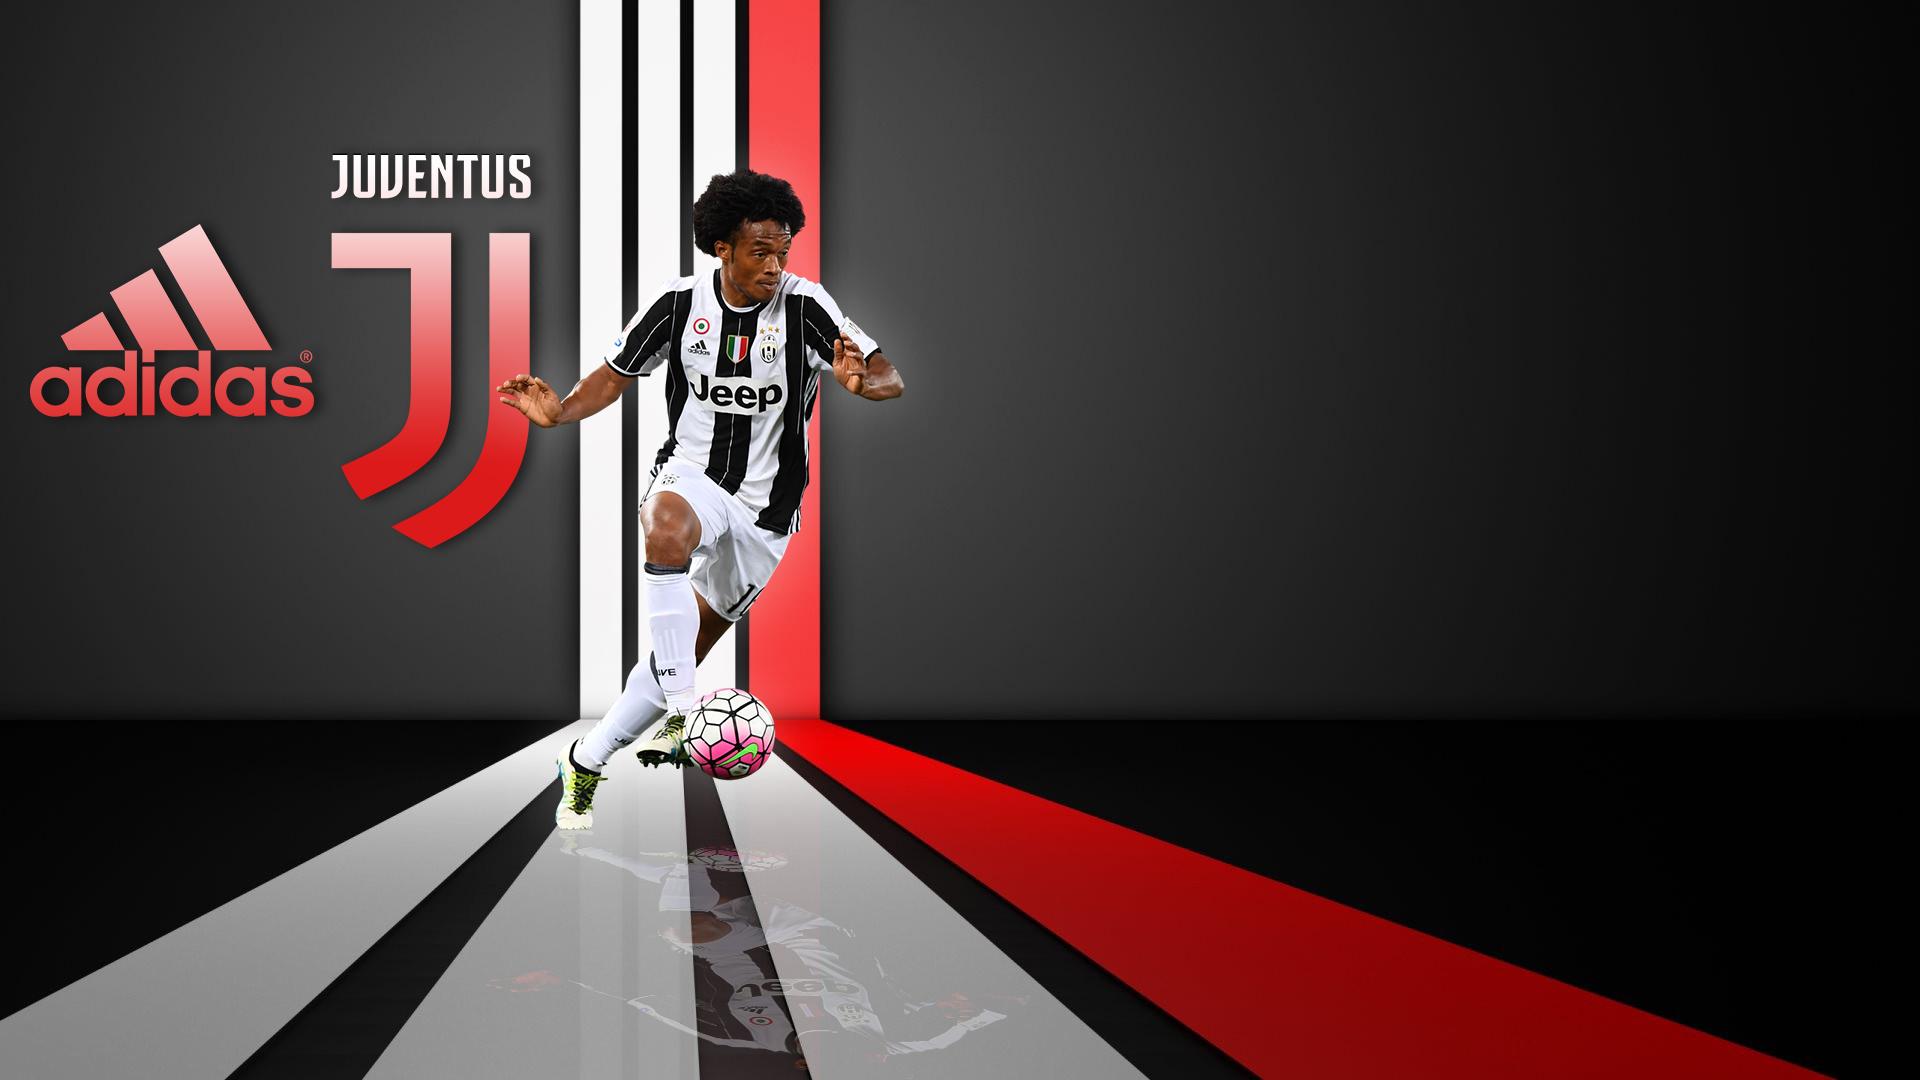 Wallpaper Juventus Adidas 1920x1080 Kahlil88 1257919 Hd Wallpapers Wallhere